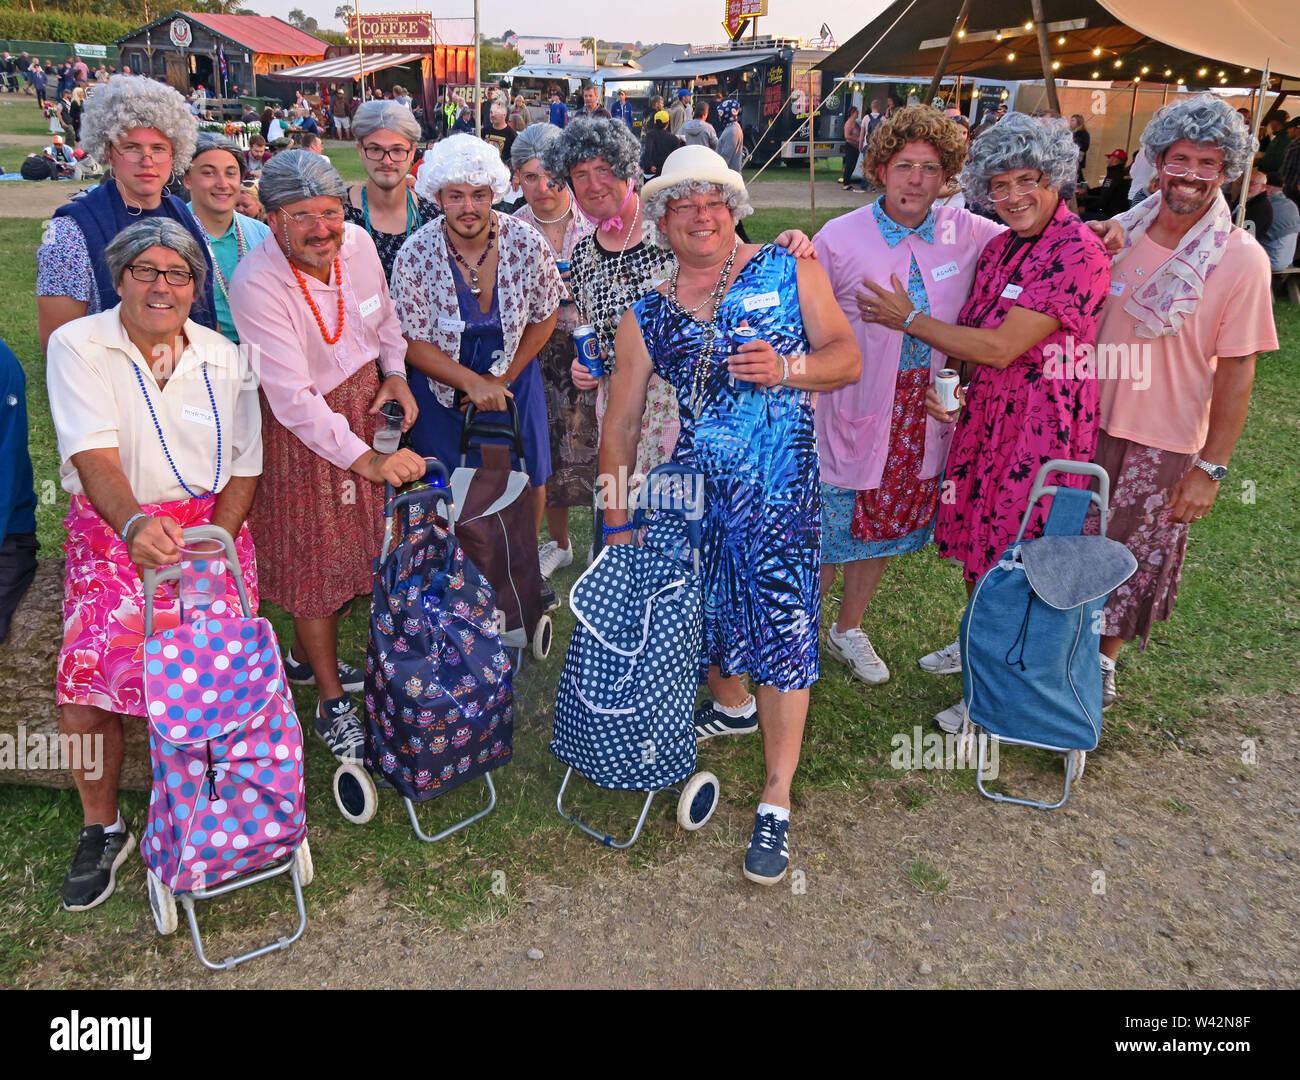 GoTonySmith,HotpixUK,@HotpixUK,Silverstone,Grand Prix,British,F1,Formula One,Formula 1,Formula1,UK,GB,GP F1,fan,fans,Great Britain,Towcester,Northamptonshire,NN12 8TN,Party of Formula One fans,Woodlands,camping,camp,site,fancy dress,having fun,party,shopping trolleys,wig,old females,crossdressing,cross-dressing,cross-dresser,mrs,Doubtfire,Formula One Fans